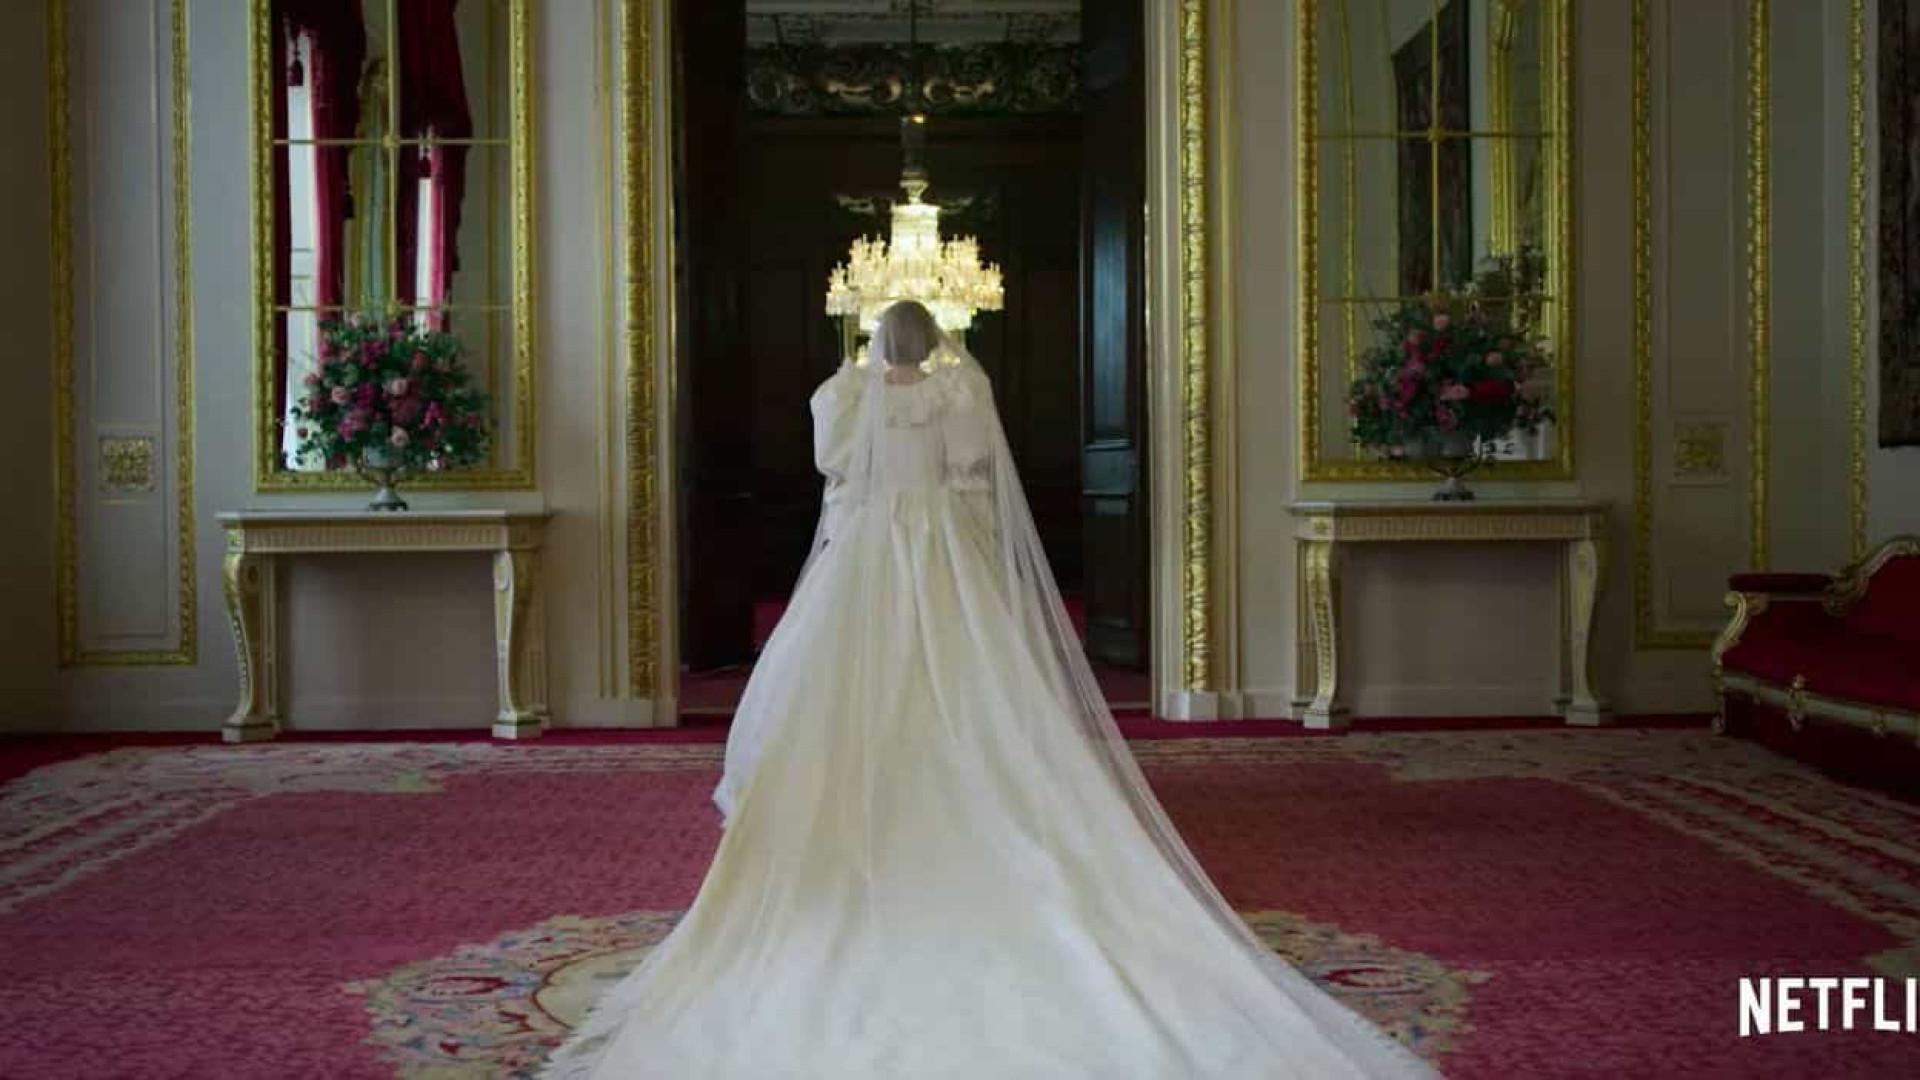 'The Crown' vai abordar luta secreta da princesa Diana contra a bulimia